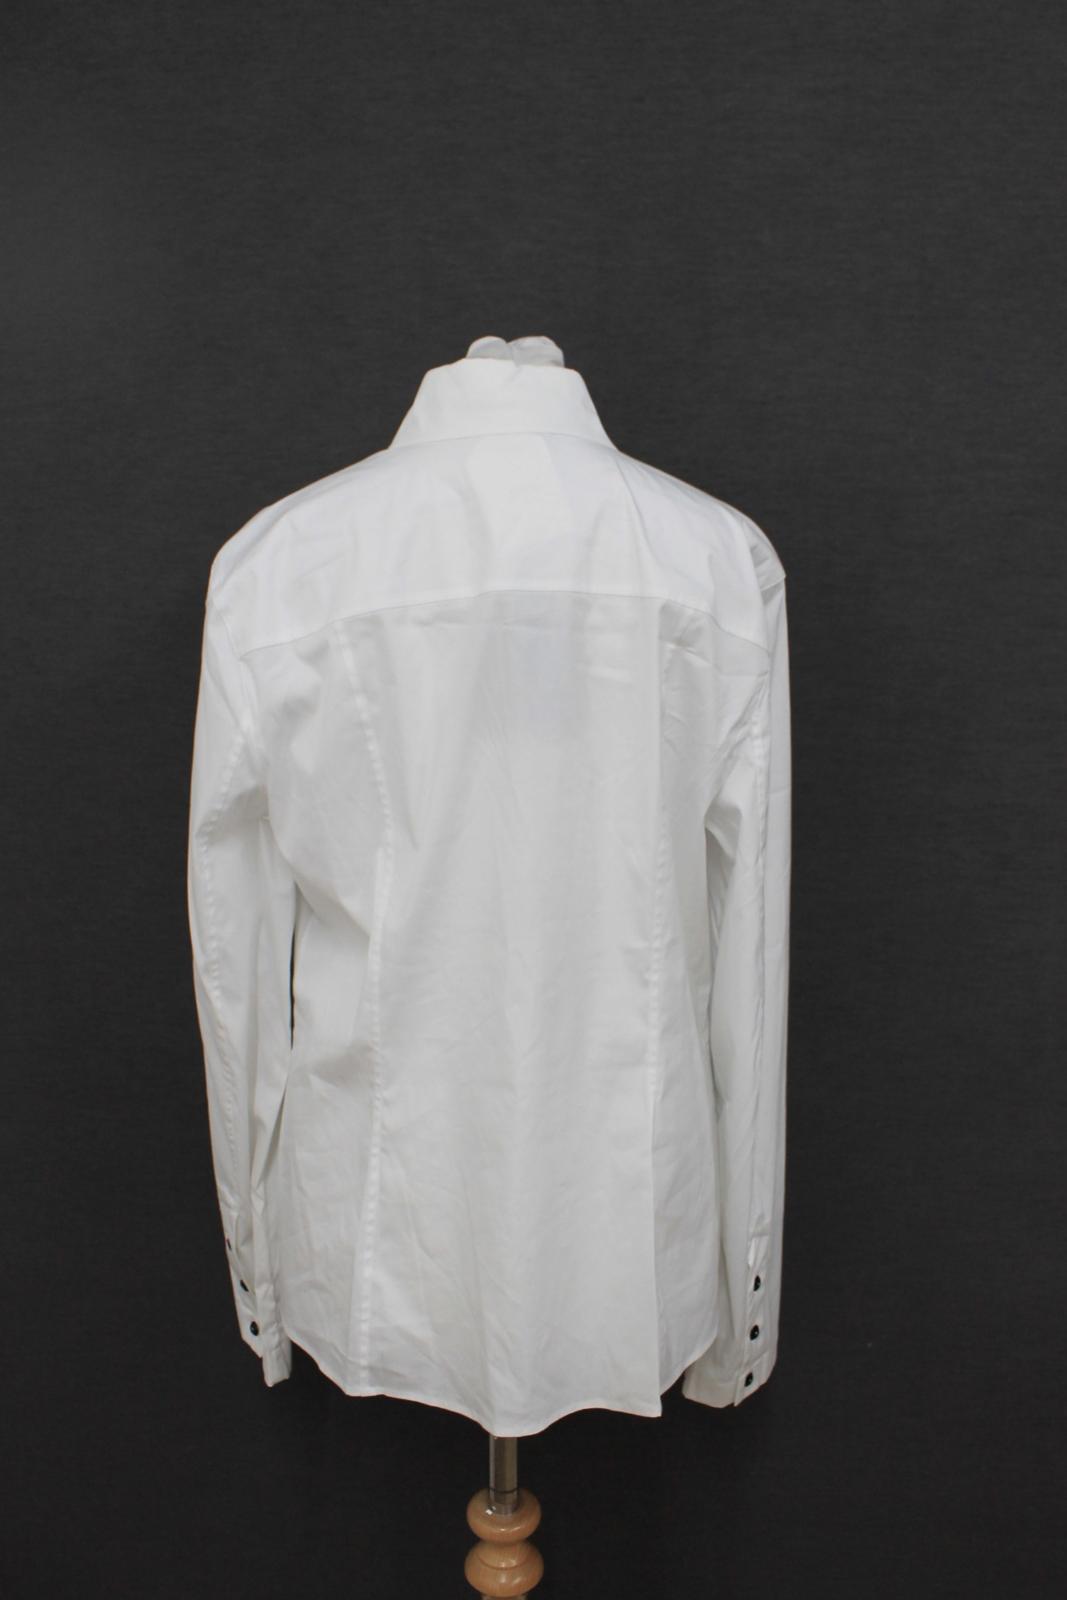 Escada De40 Detailed Size Bnwt Black Ladies Long Lace Shirt Sleeved Uk14 White vddq7g